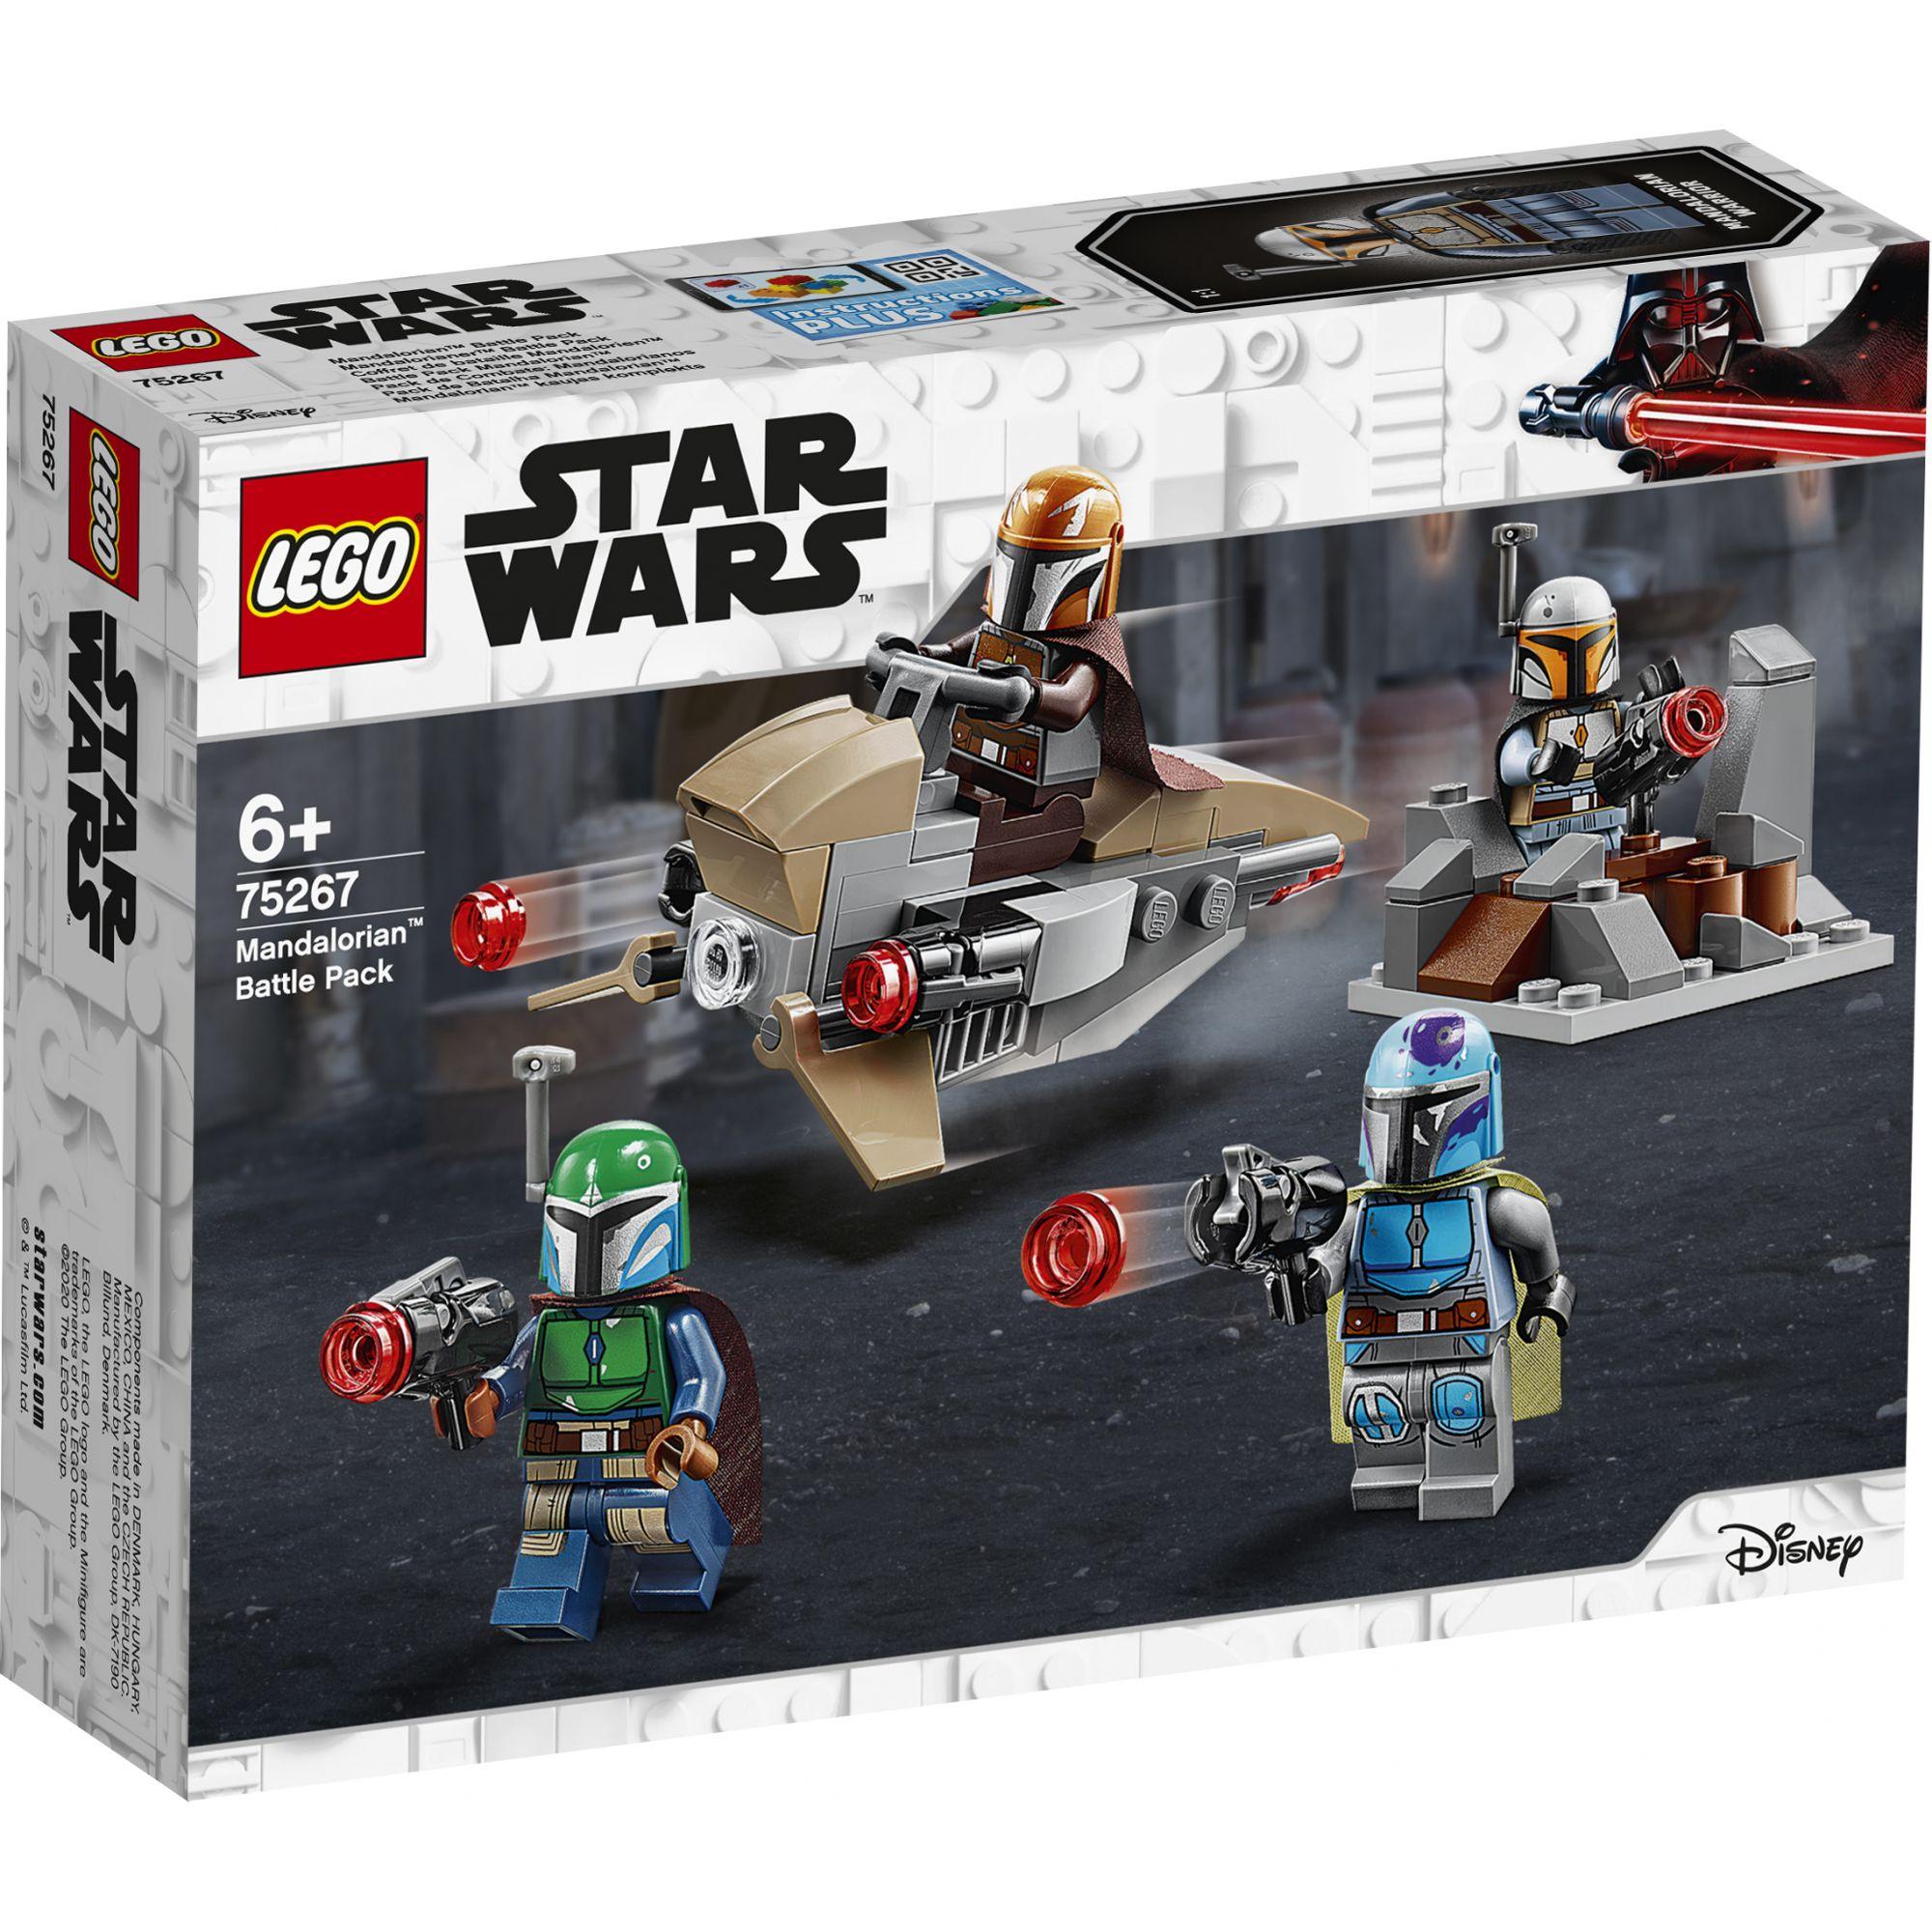 LEGO Star Wars Mandalorian Battle Pack Mandalorian - 75267